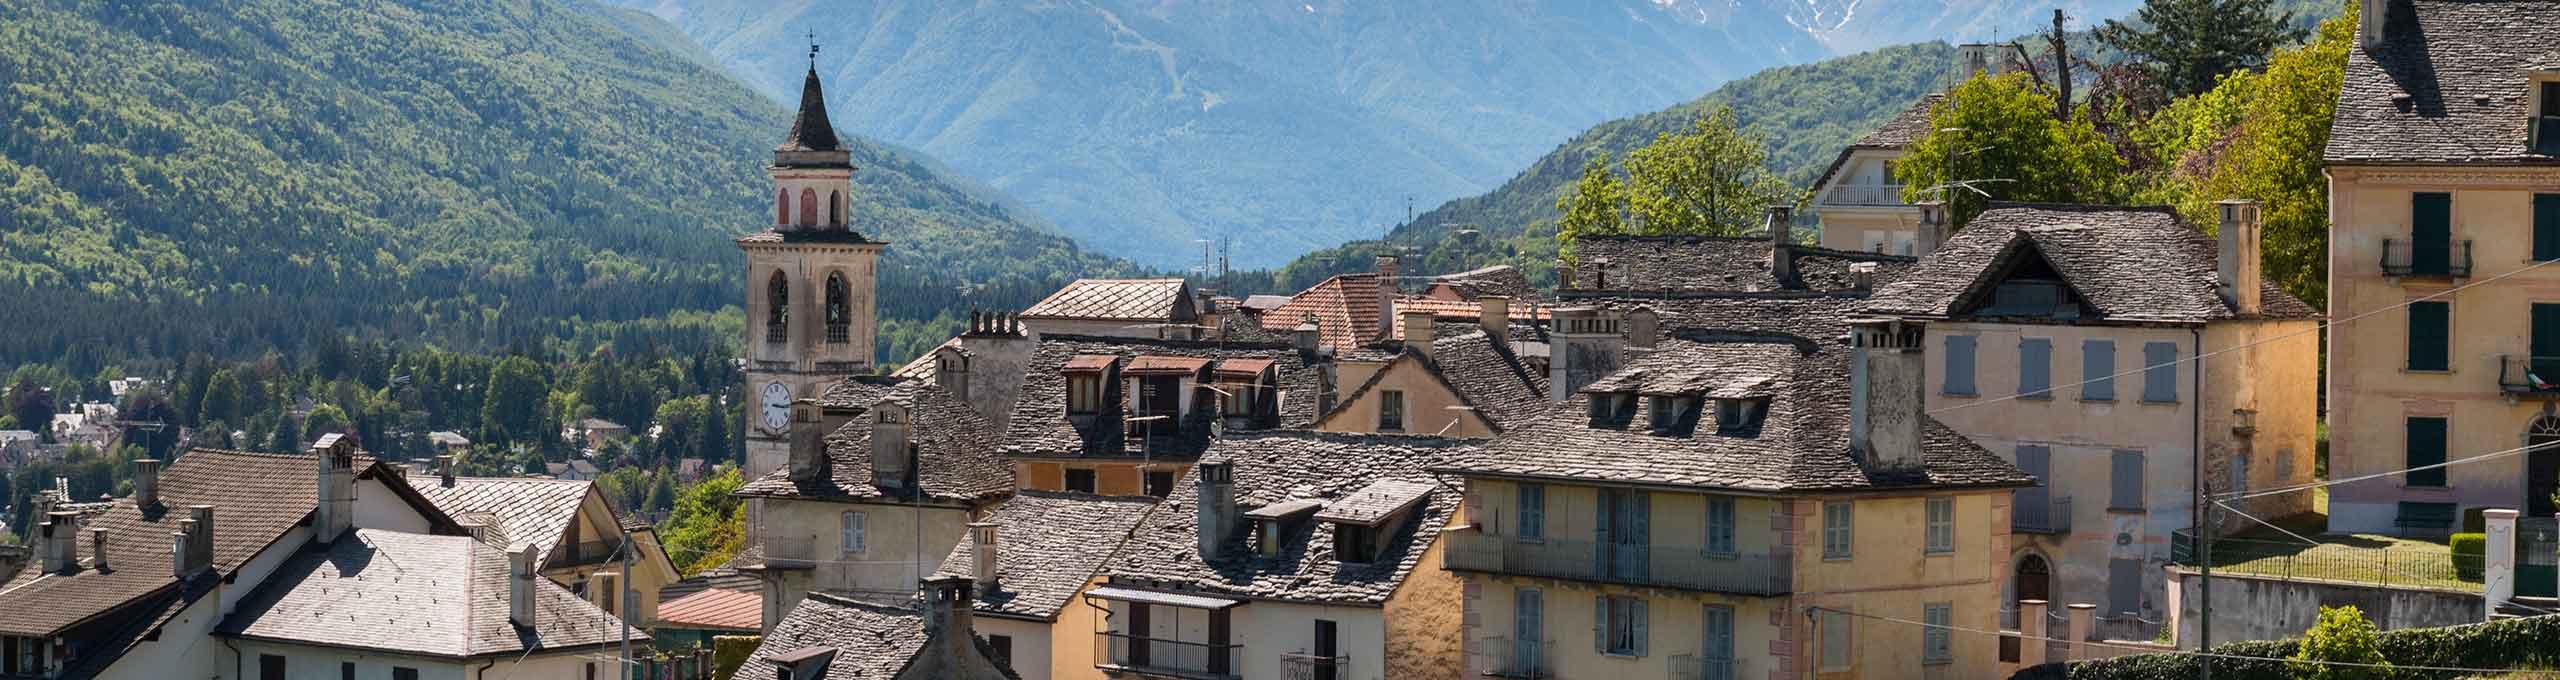 Craveggia, Val D'Ossola